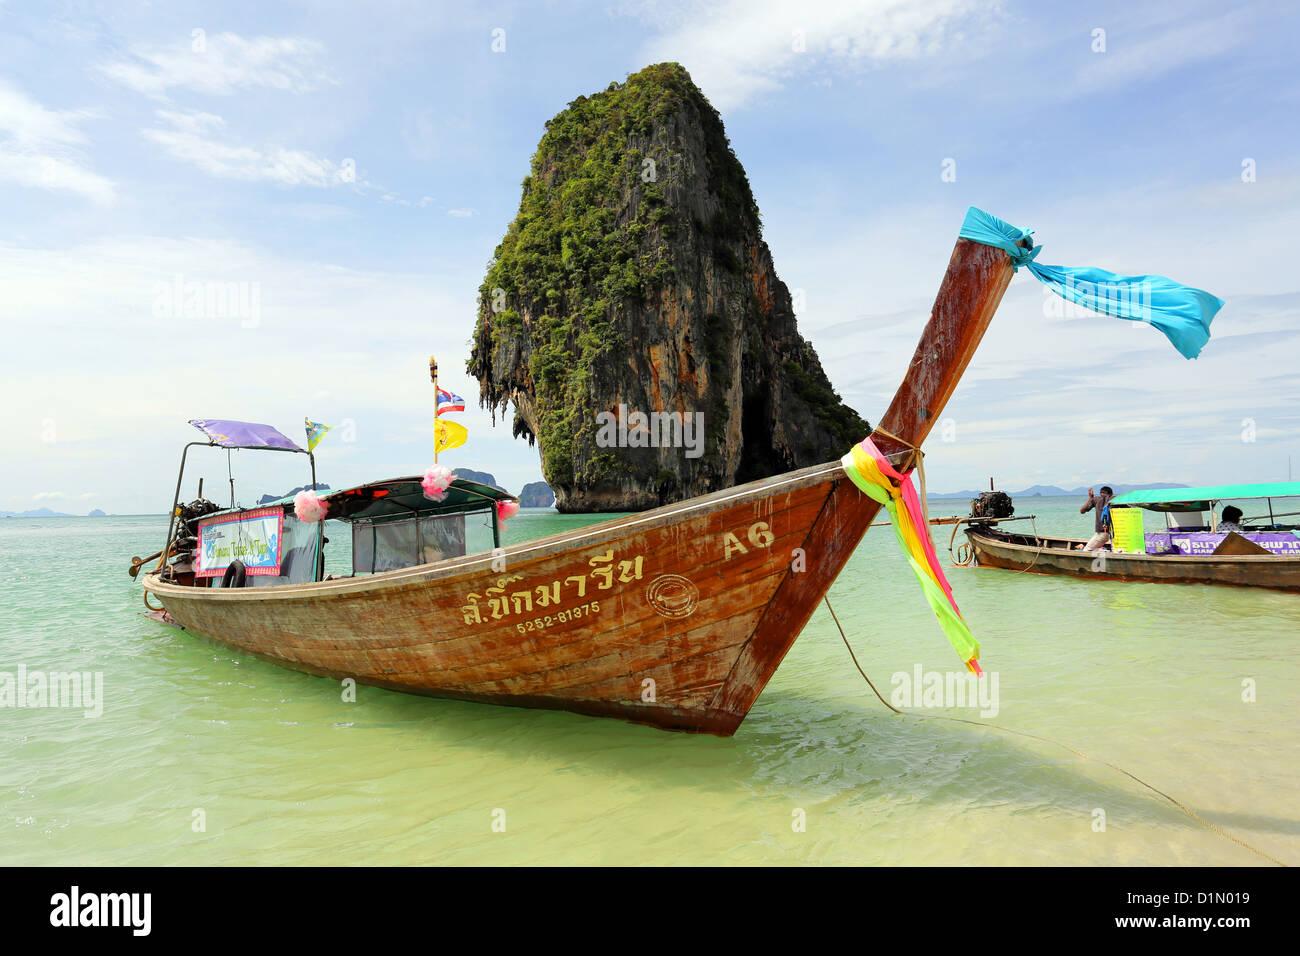 Thaï traditionnel bateau à longue queue Phranang Cave Beach, Railay Beach, Krabi, Phuket, Thailand Banque D'Images